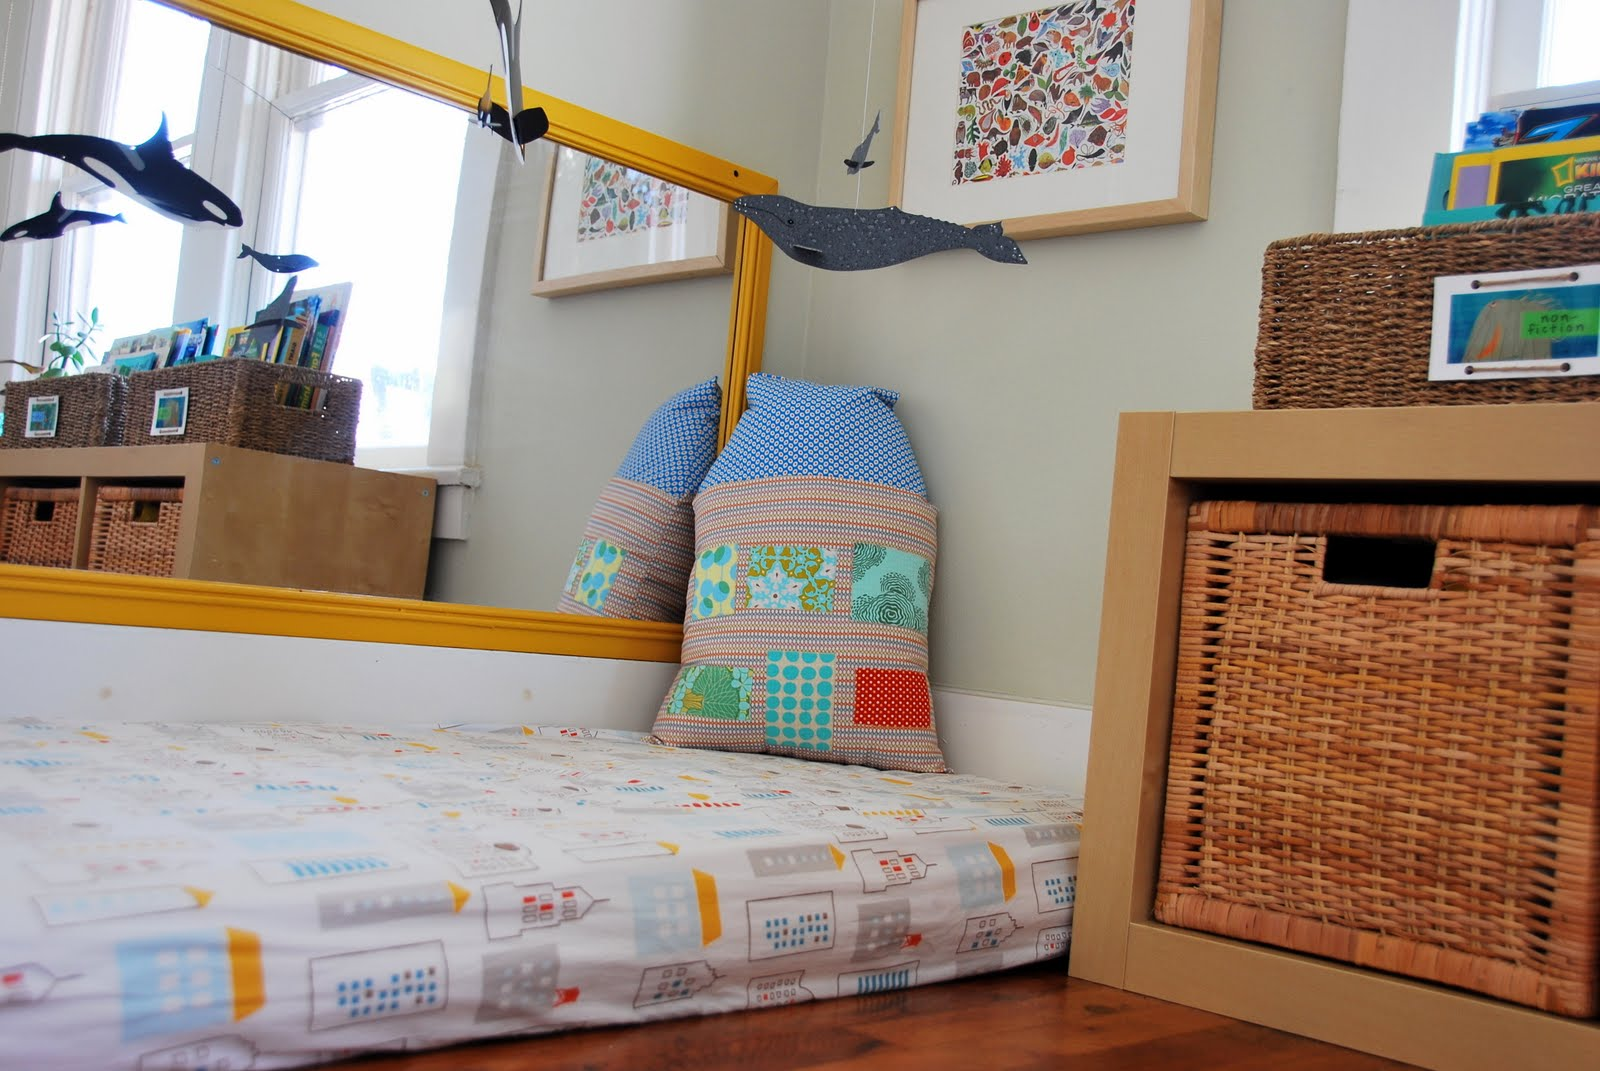 Montessori una habitaci n diferente room room beb for Espejo montessori